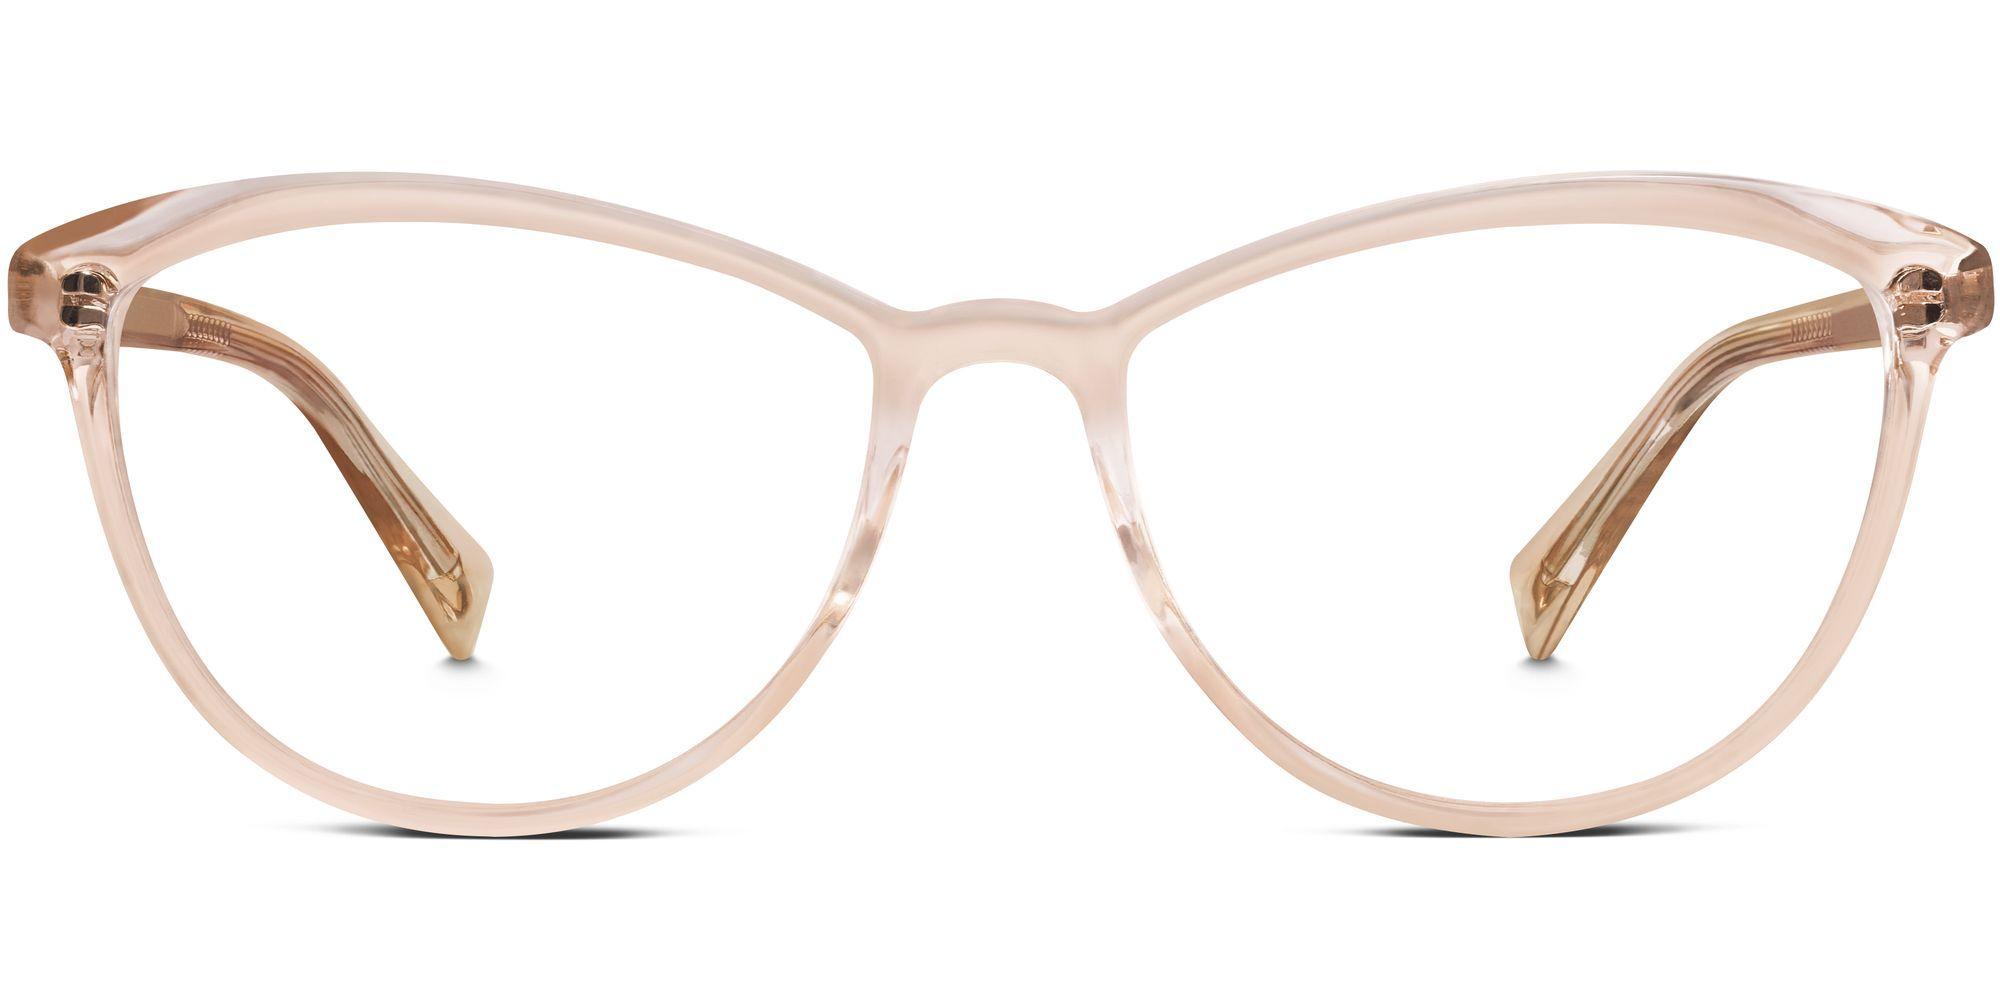 Michael Kors MK839 | Michael kors glasses, Coastal and Michael kors